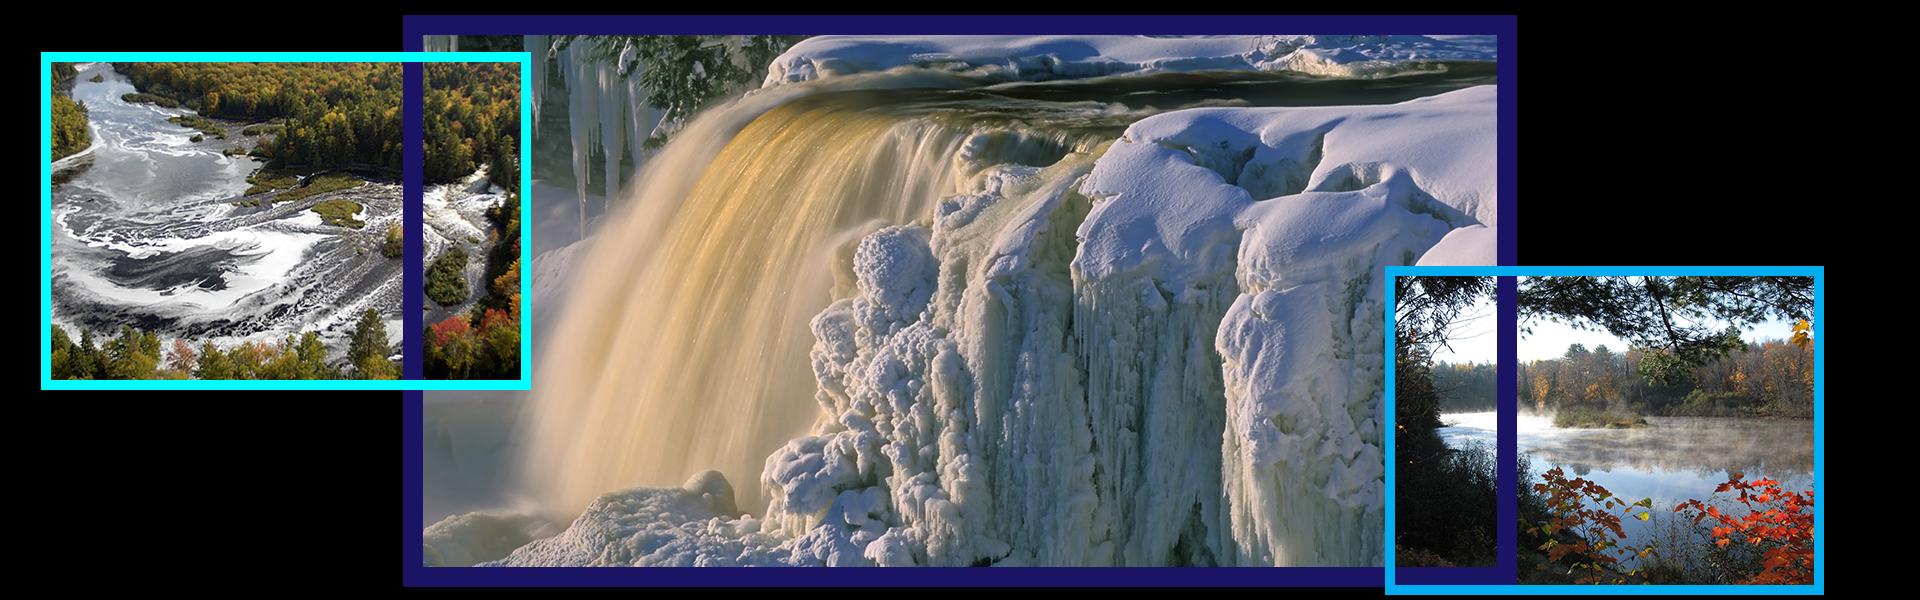 Tahquamenon Falls State Park, Paradise, Michigan